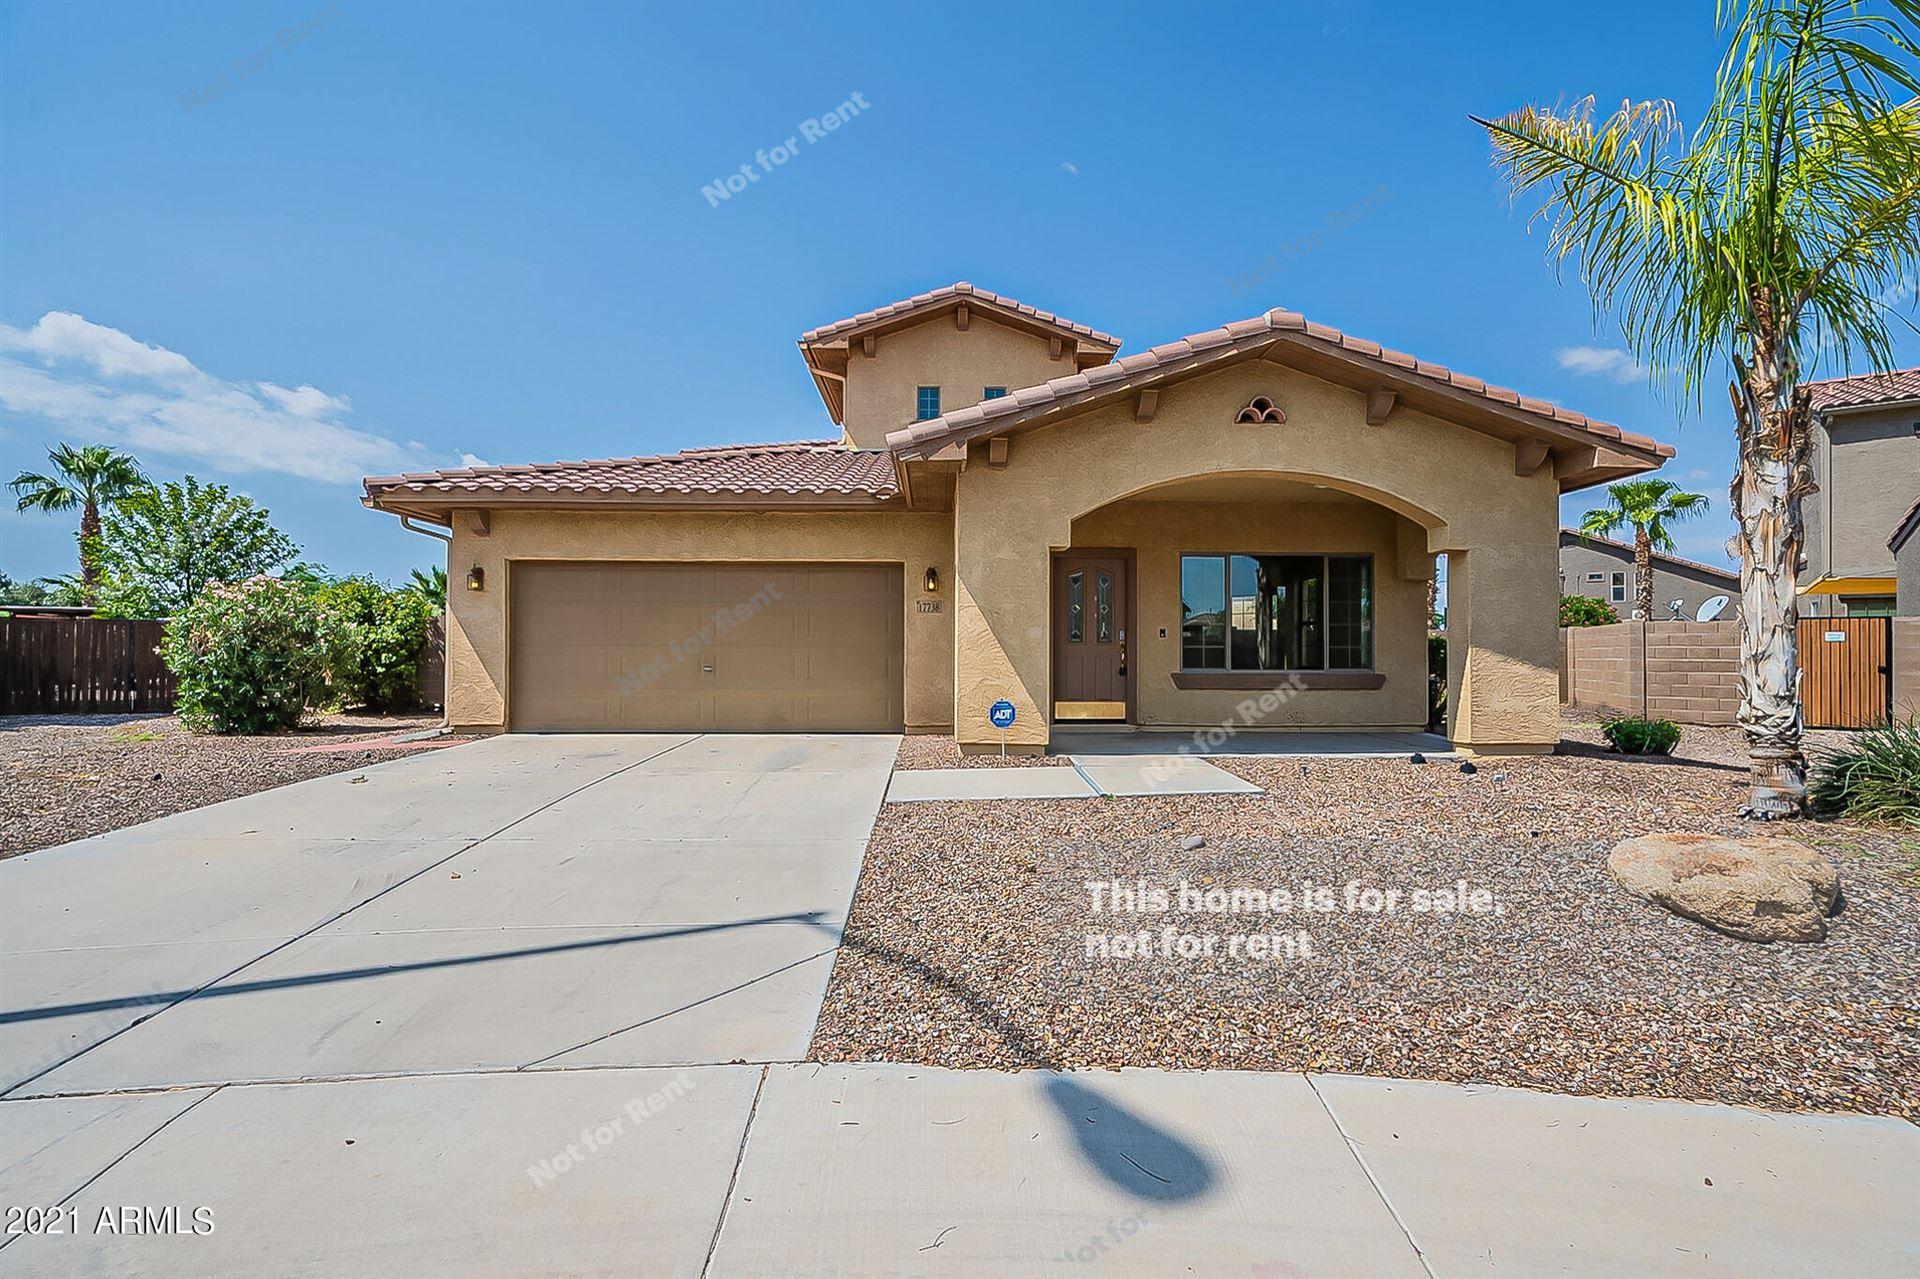 Photo for 17738 N CARMEN Avenue, Maricopa, AZ 85139 (MLS # 6289580)